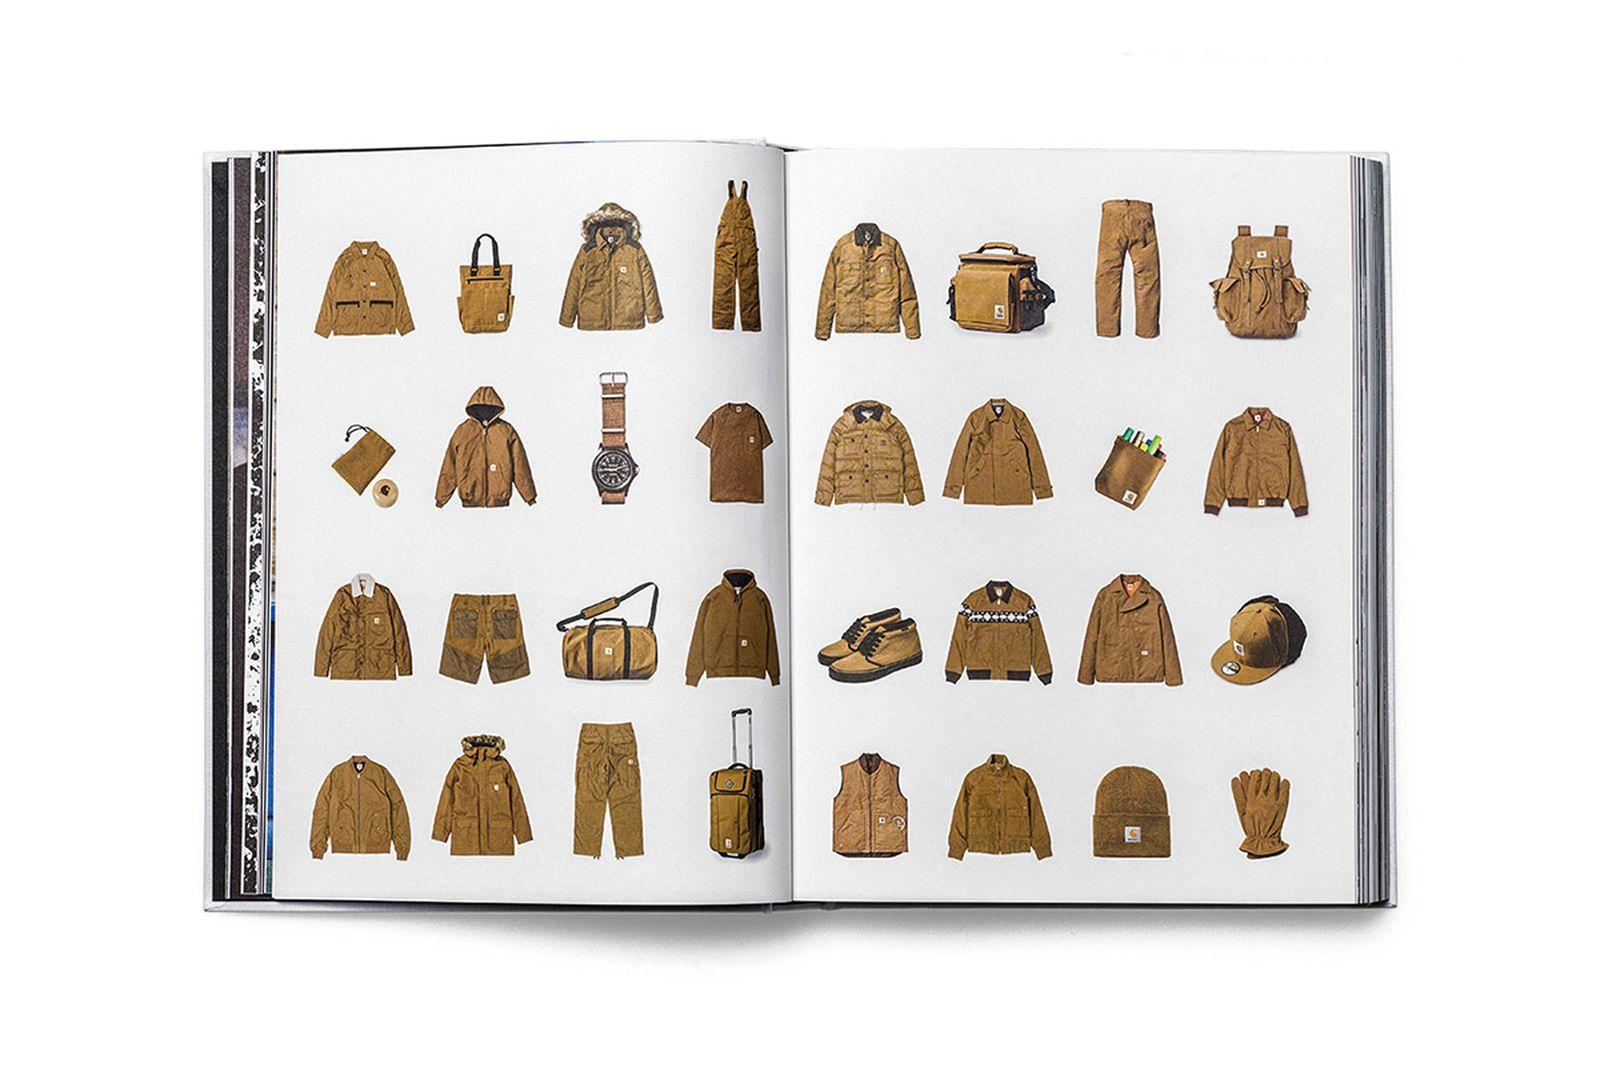 carhartt-wip-archives-streetwear-25-anniversary-16